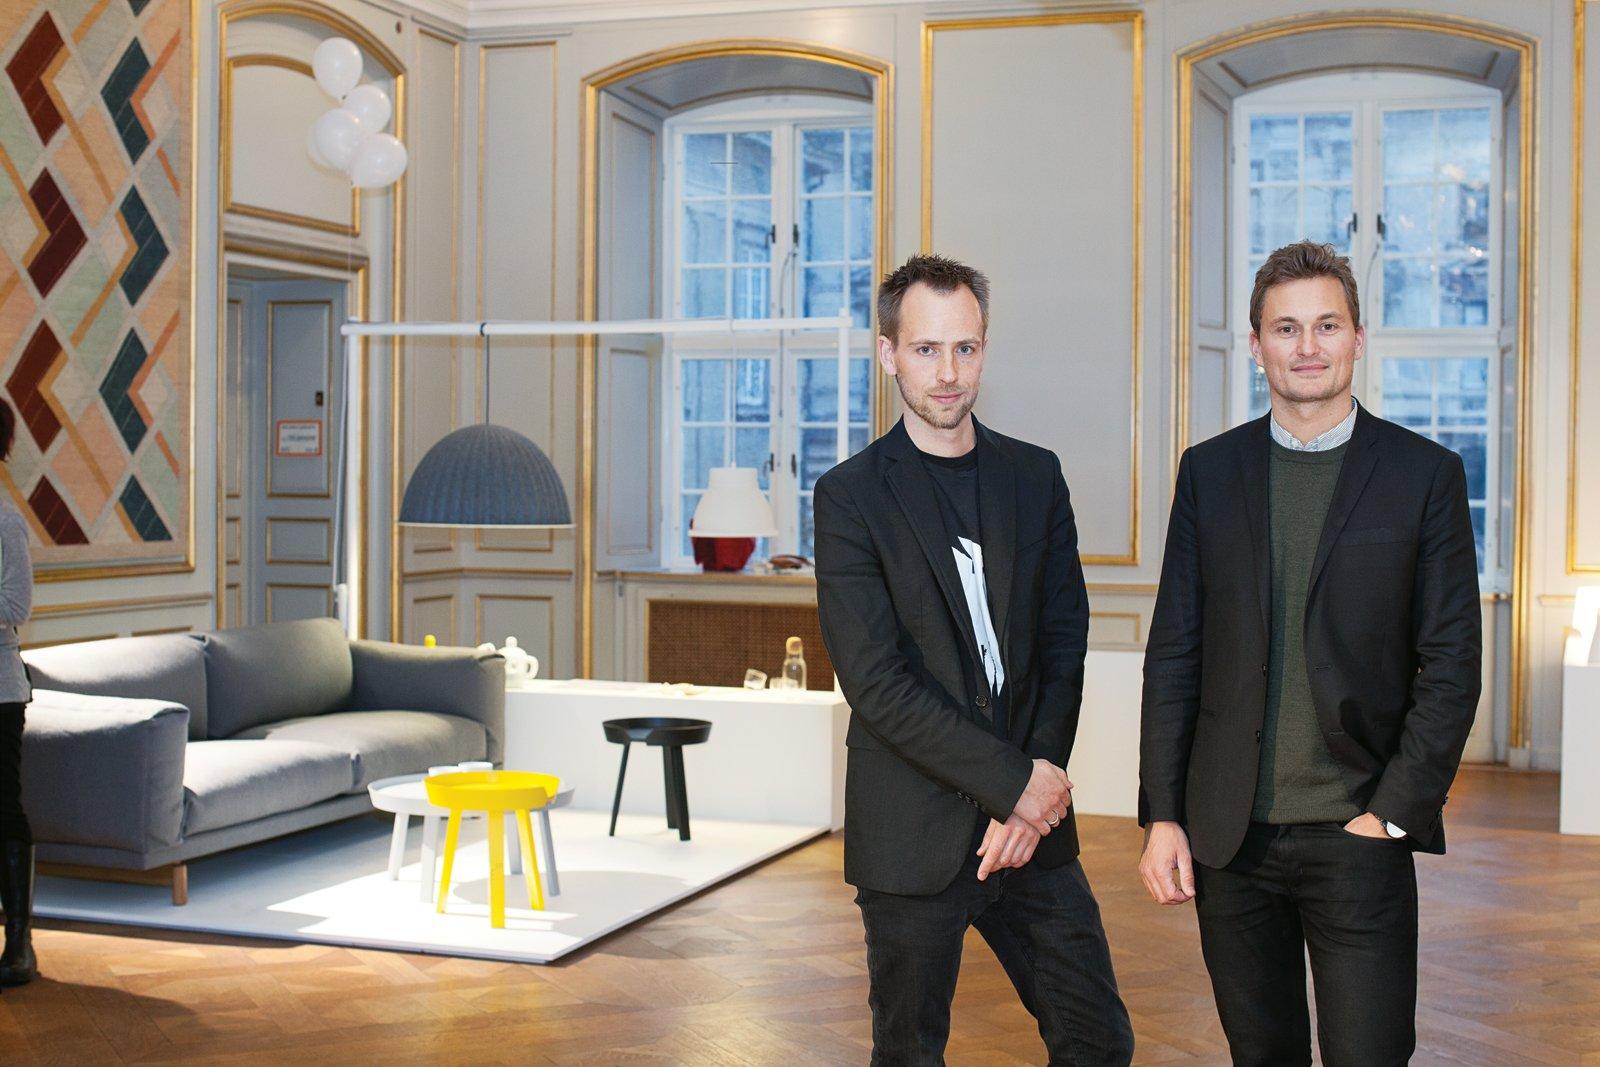 Muuto's Peter Bonnen and Kristian Byrge at last year's Designmuseum Danmark exhibition celebrating the company's five-year anniversary.  Photo 2 of 9 in Scandinavian Design Focus: Muuto